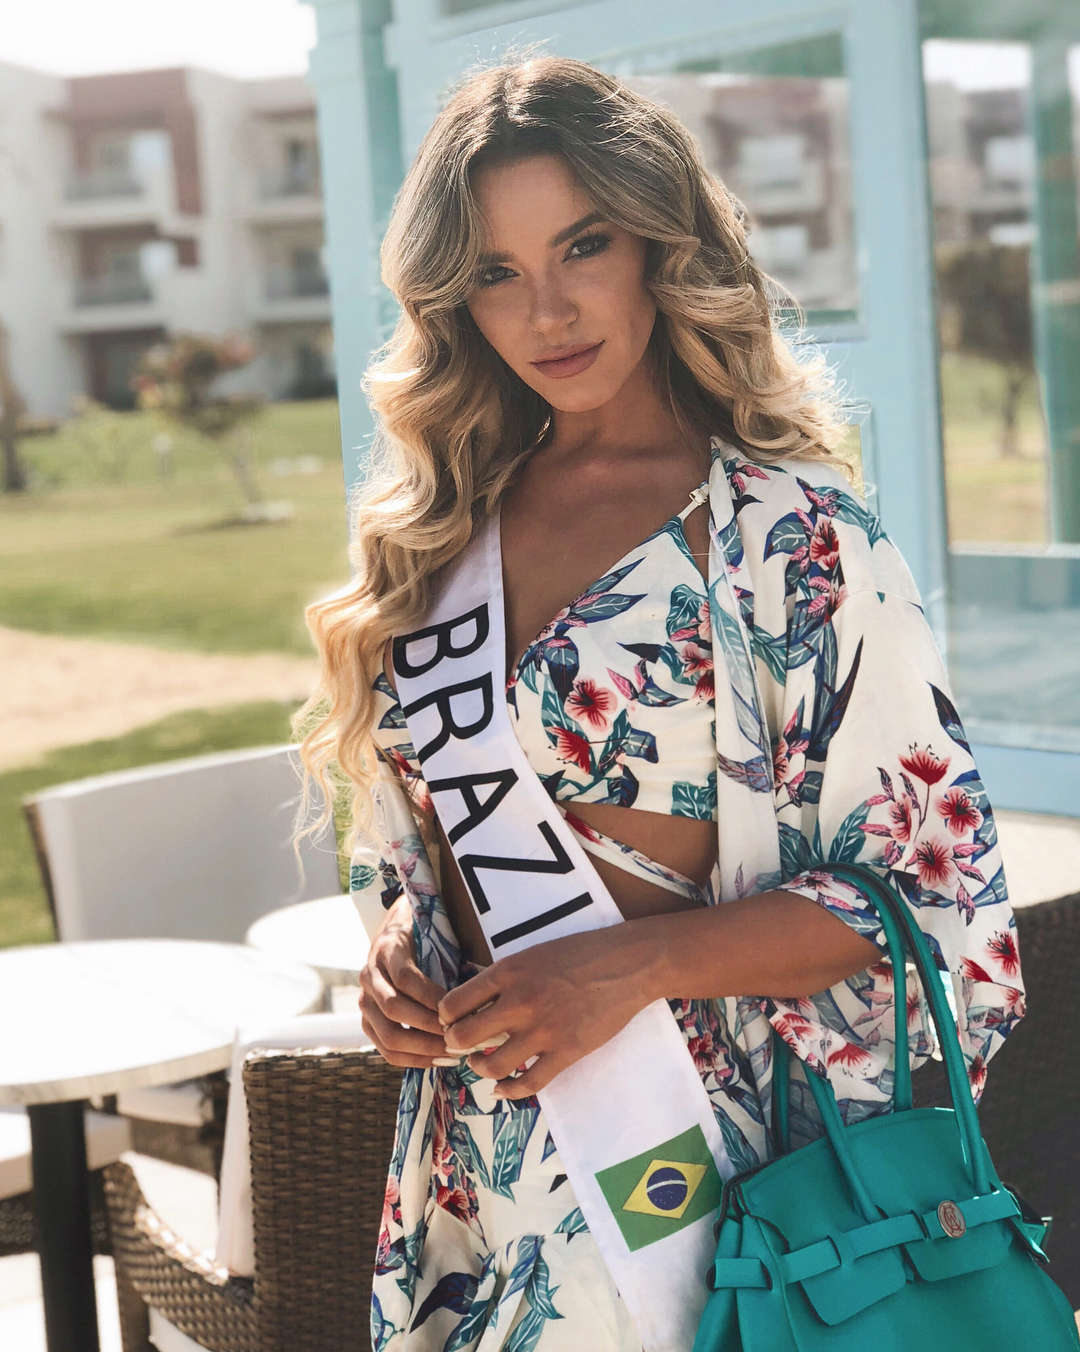 amanda cardoso, miss grand espirito santo 2019/3rd runner-up de miss intercontinental 2017. - Página 5 26154411